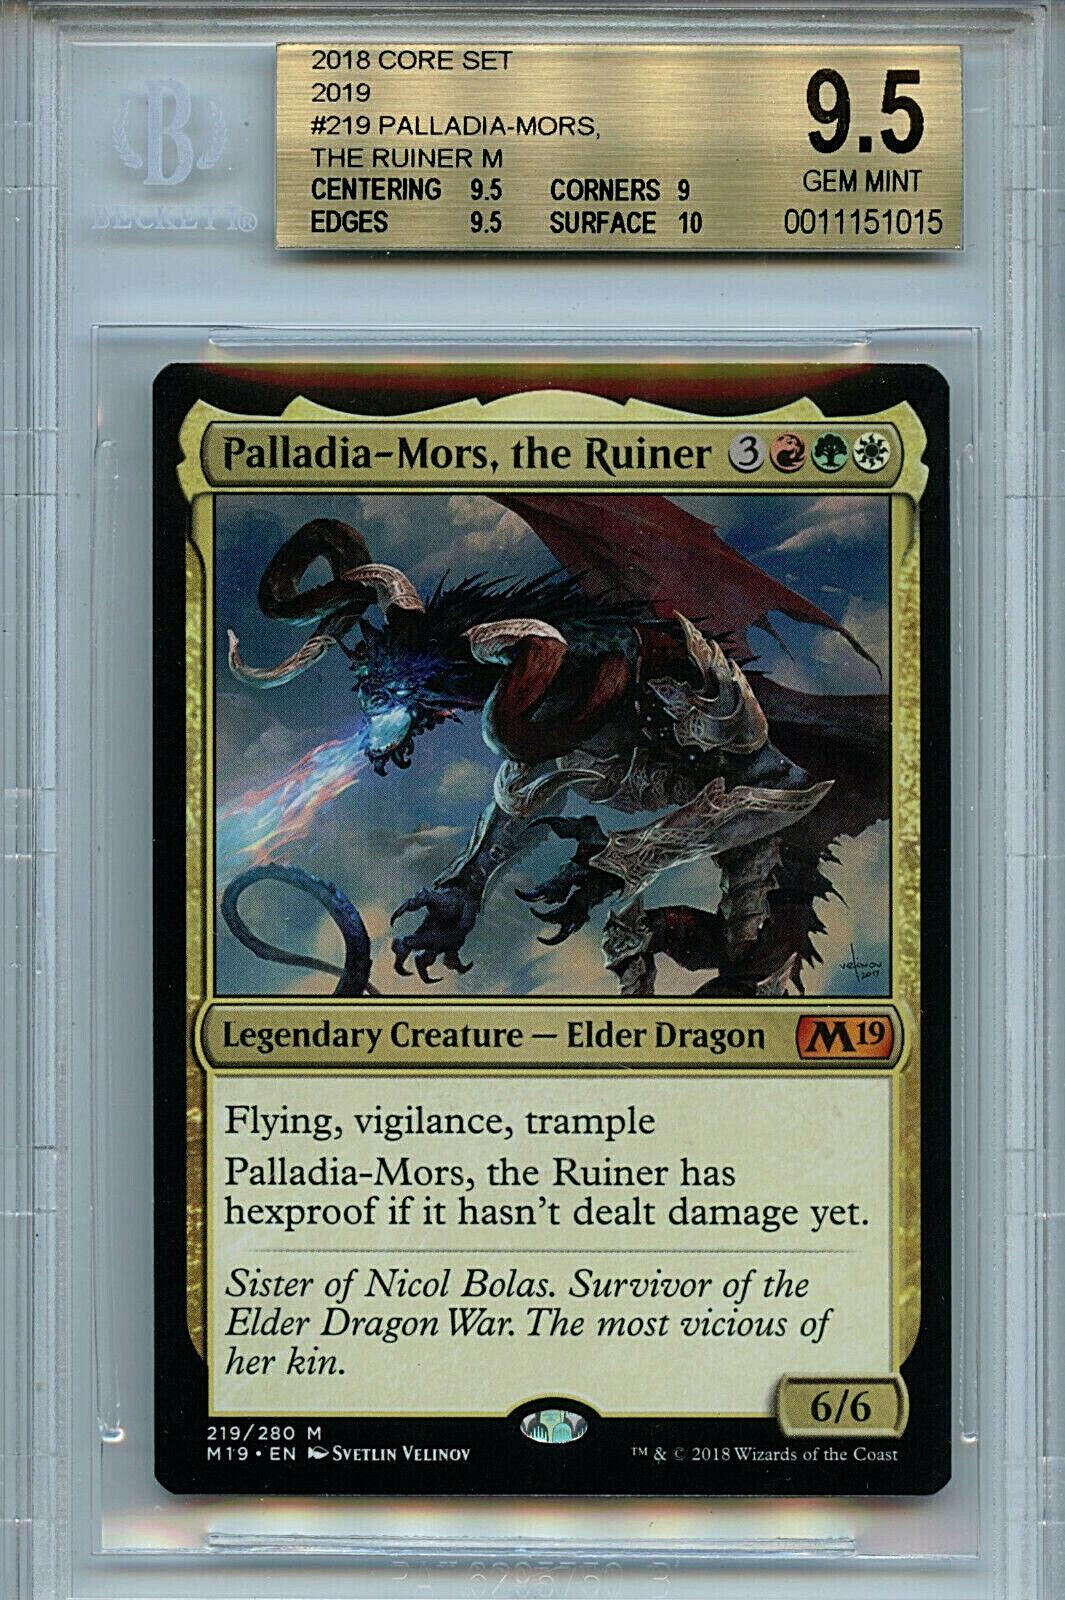 MTG Palladia-Mors Ruiner BGS 9.5 Gem Mint M19 Core Set Magic Autod Amricons 1015